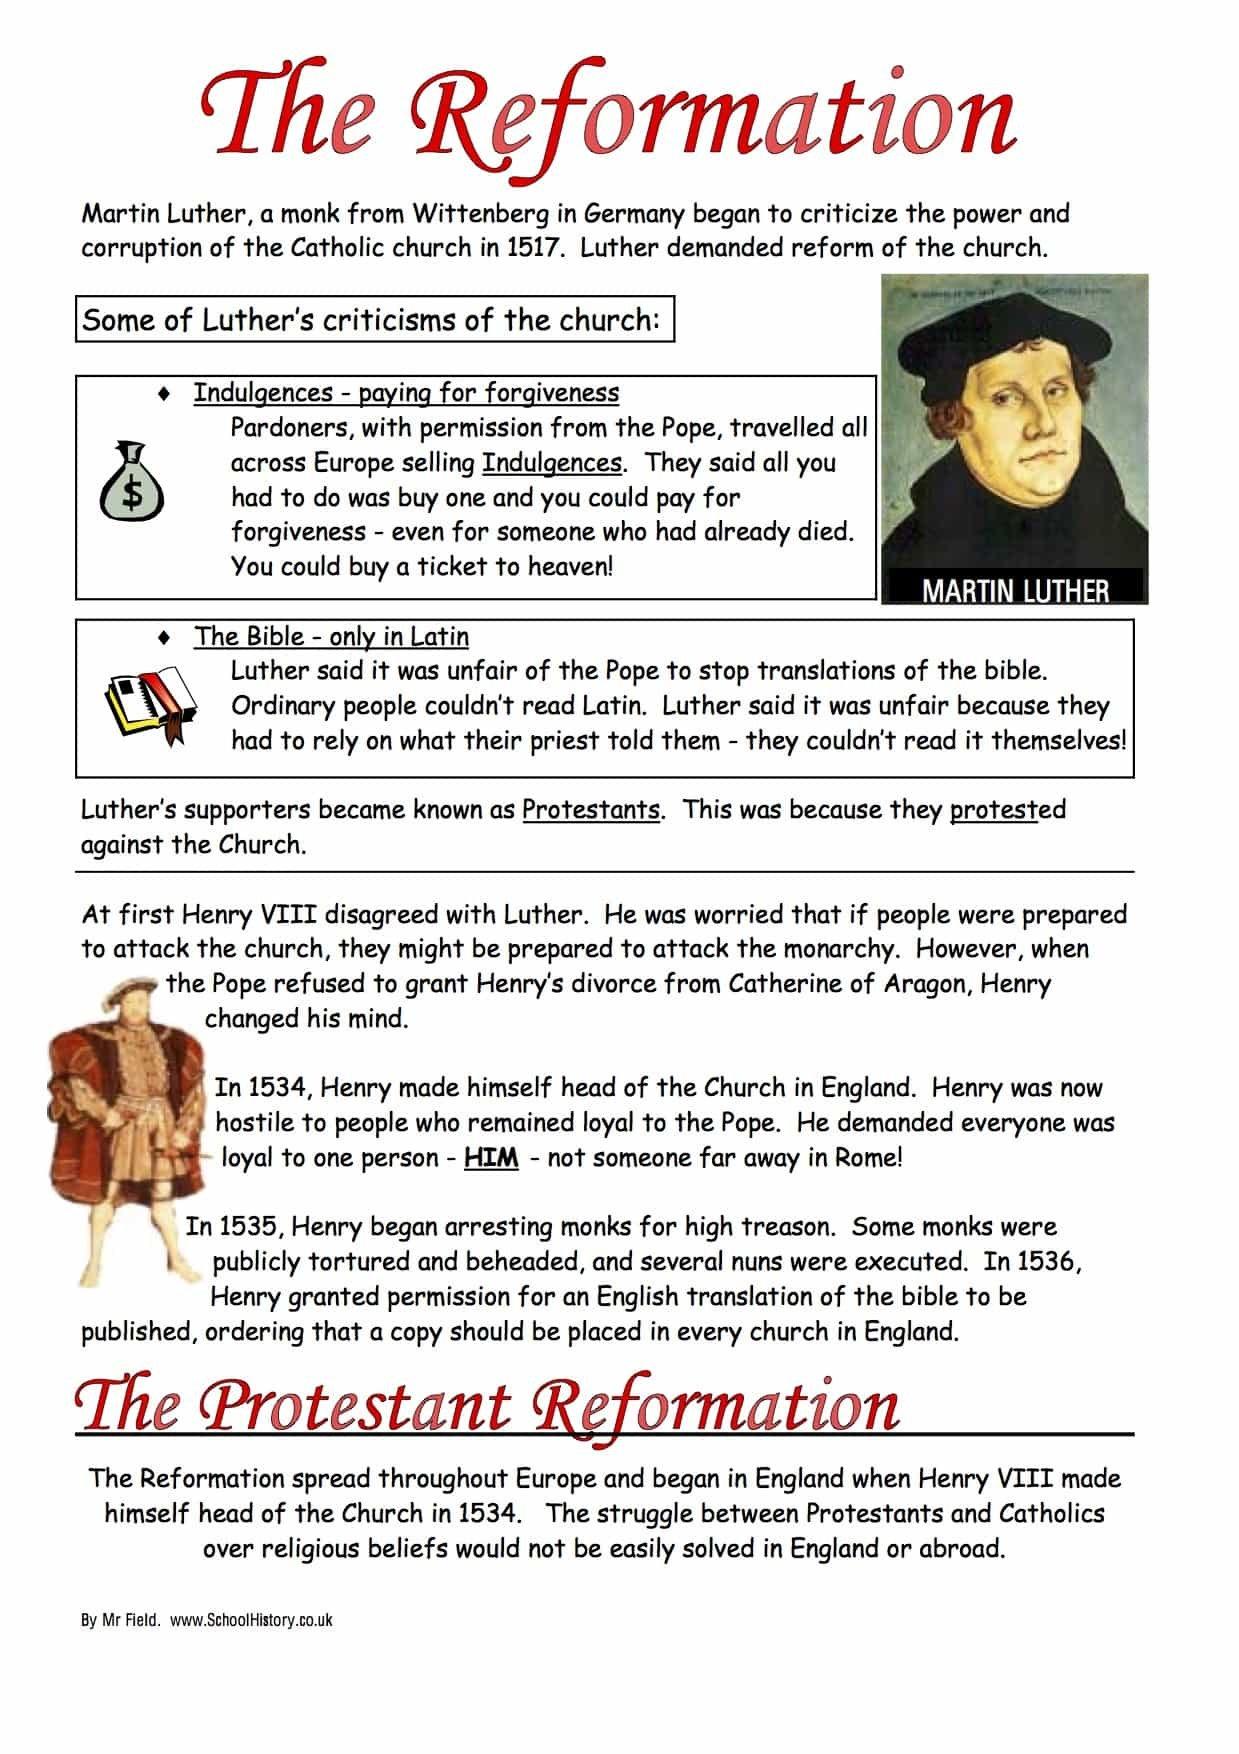 Protestant Reformation Worksheet Pdf As Coordinate Plane Worksheets Throughout Protestant Reformation Worksheet Answers